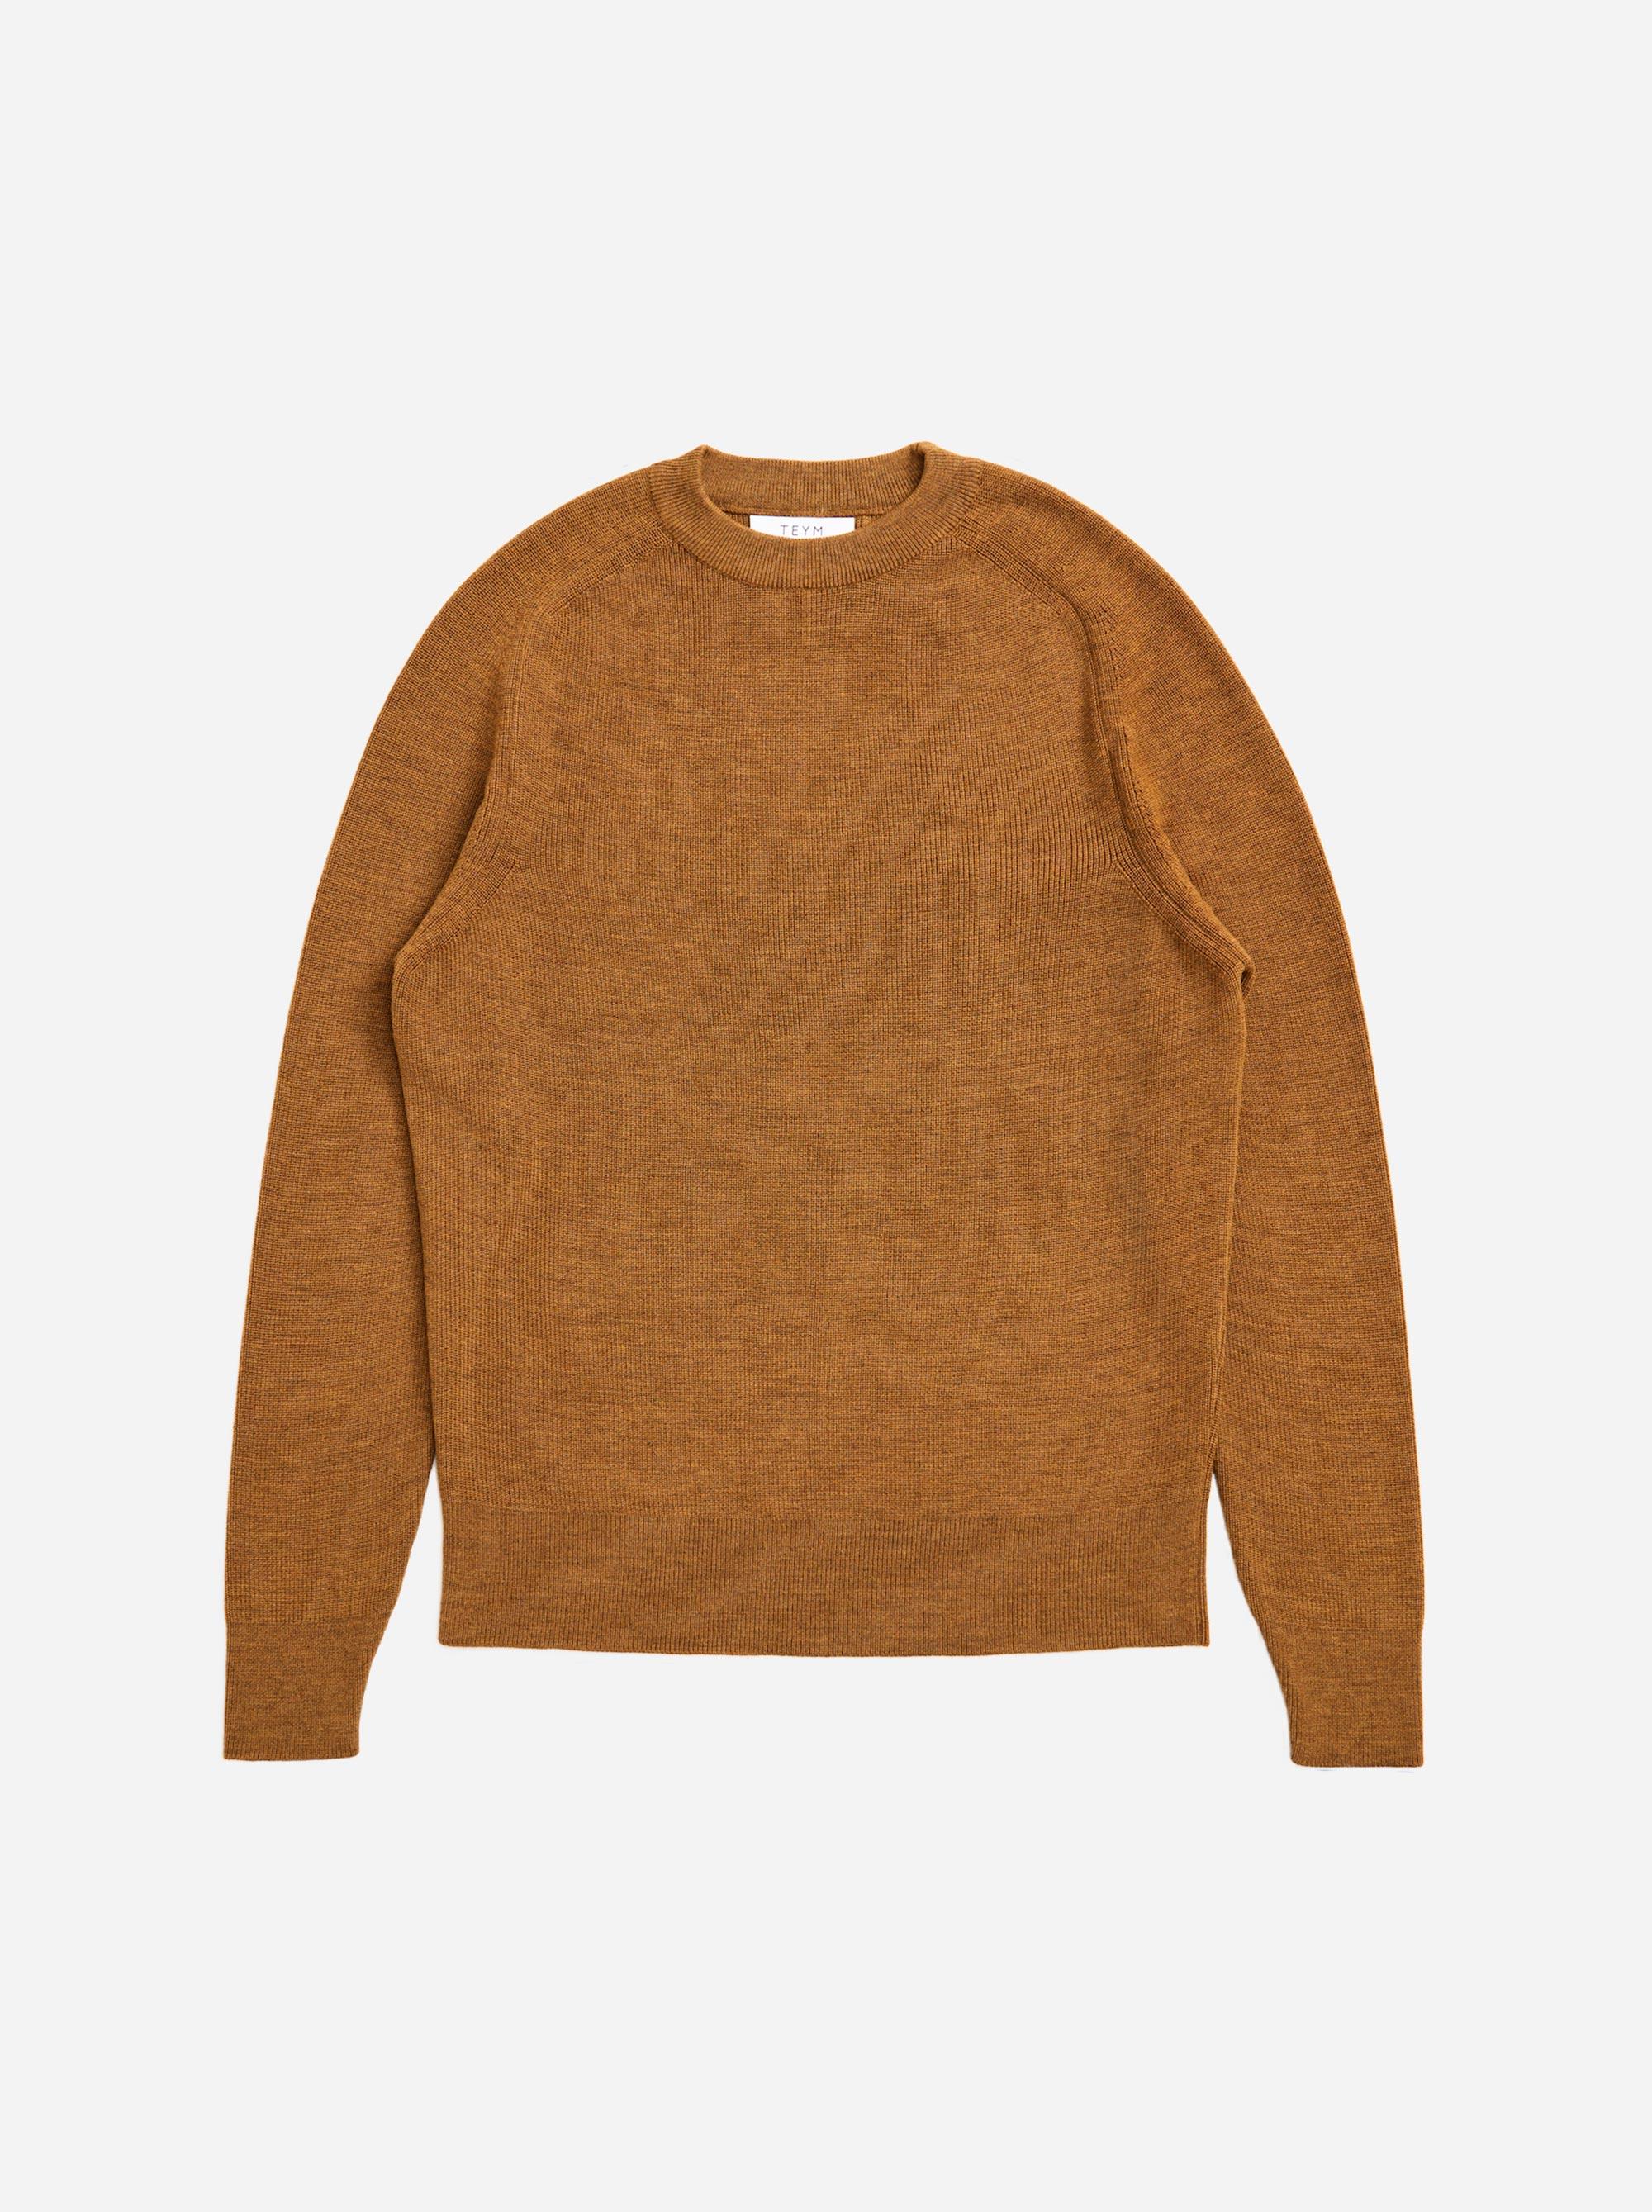 Teym - Crewneck - The Merino Sweater - Women - Mustard - 4